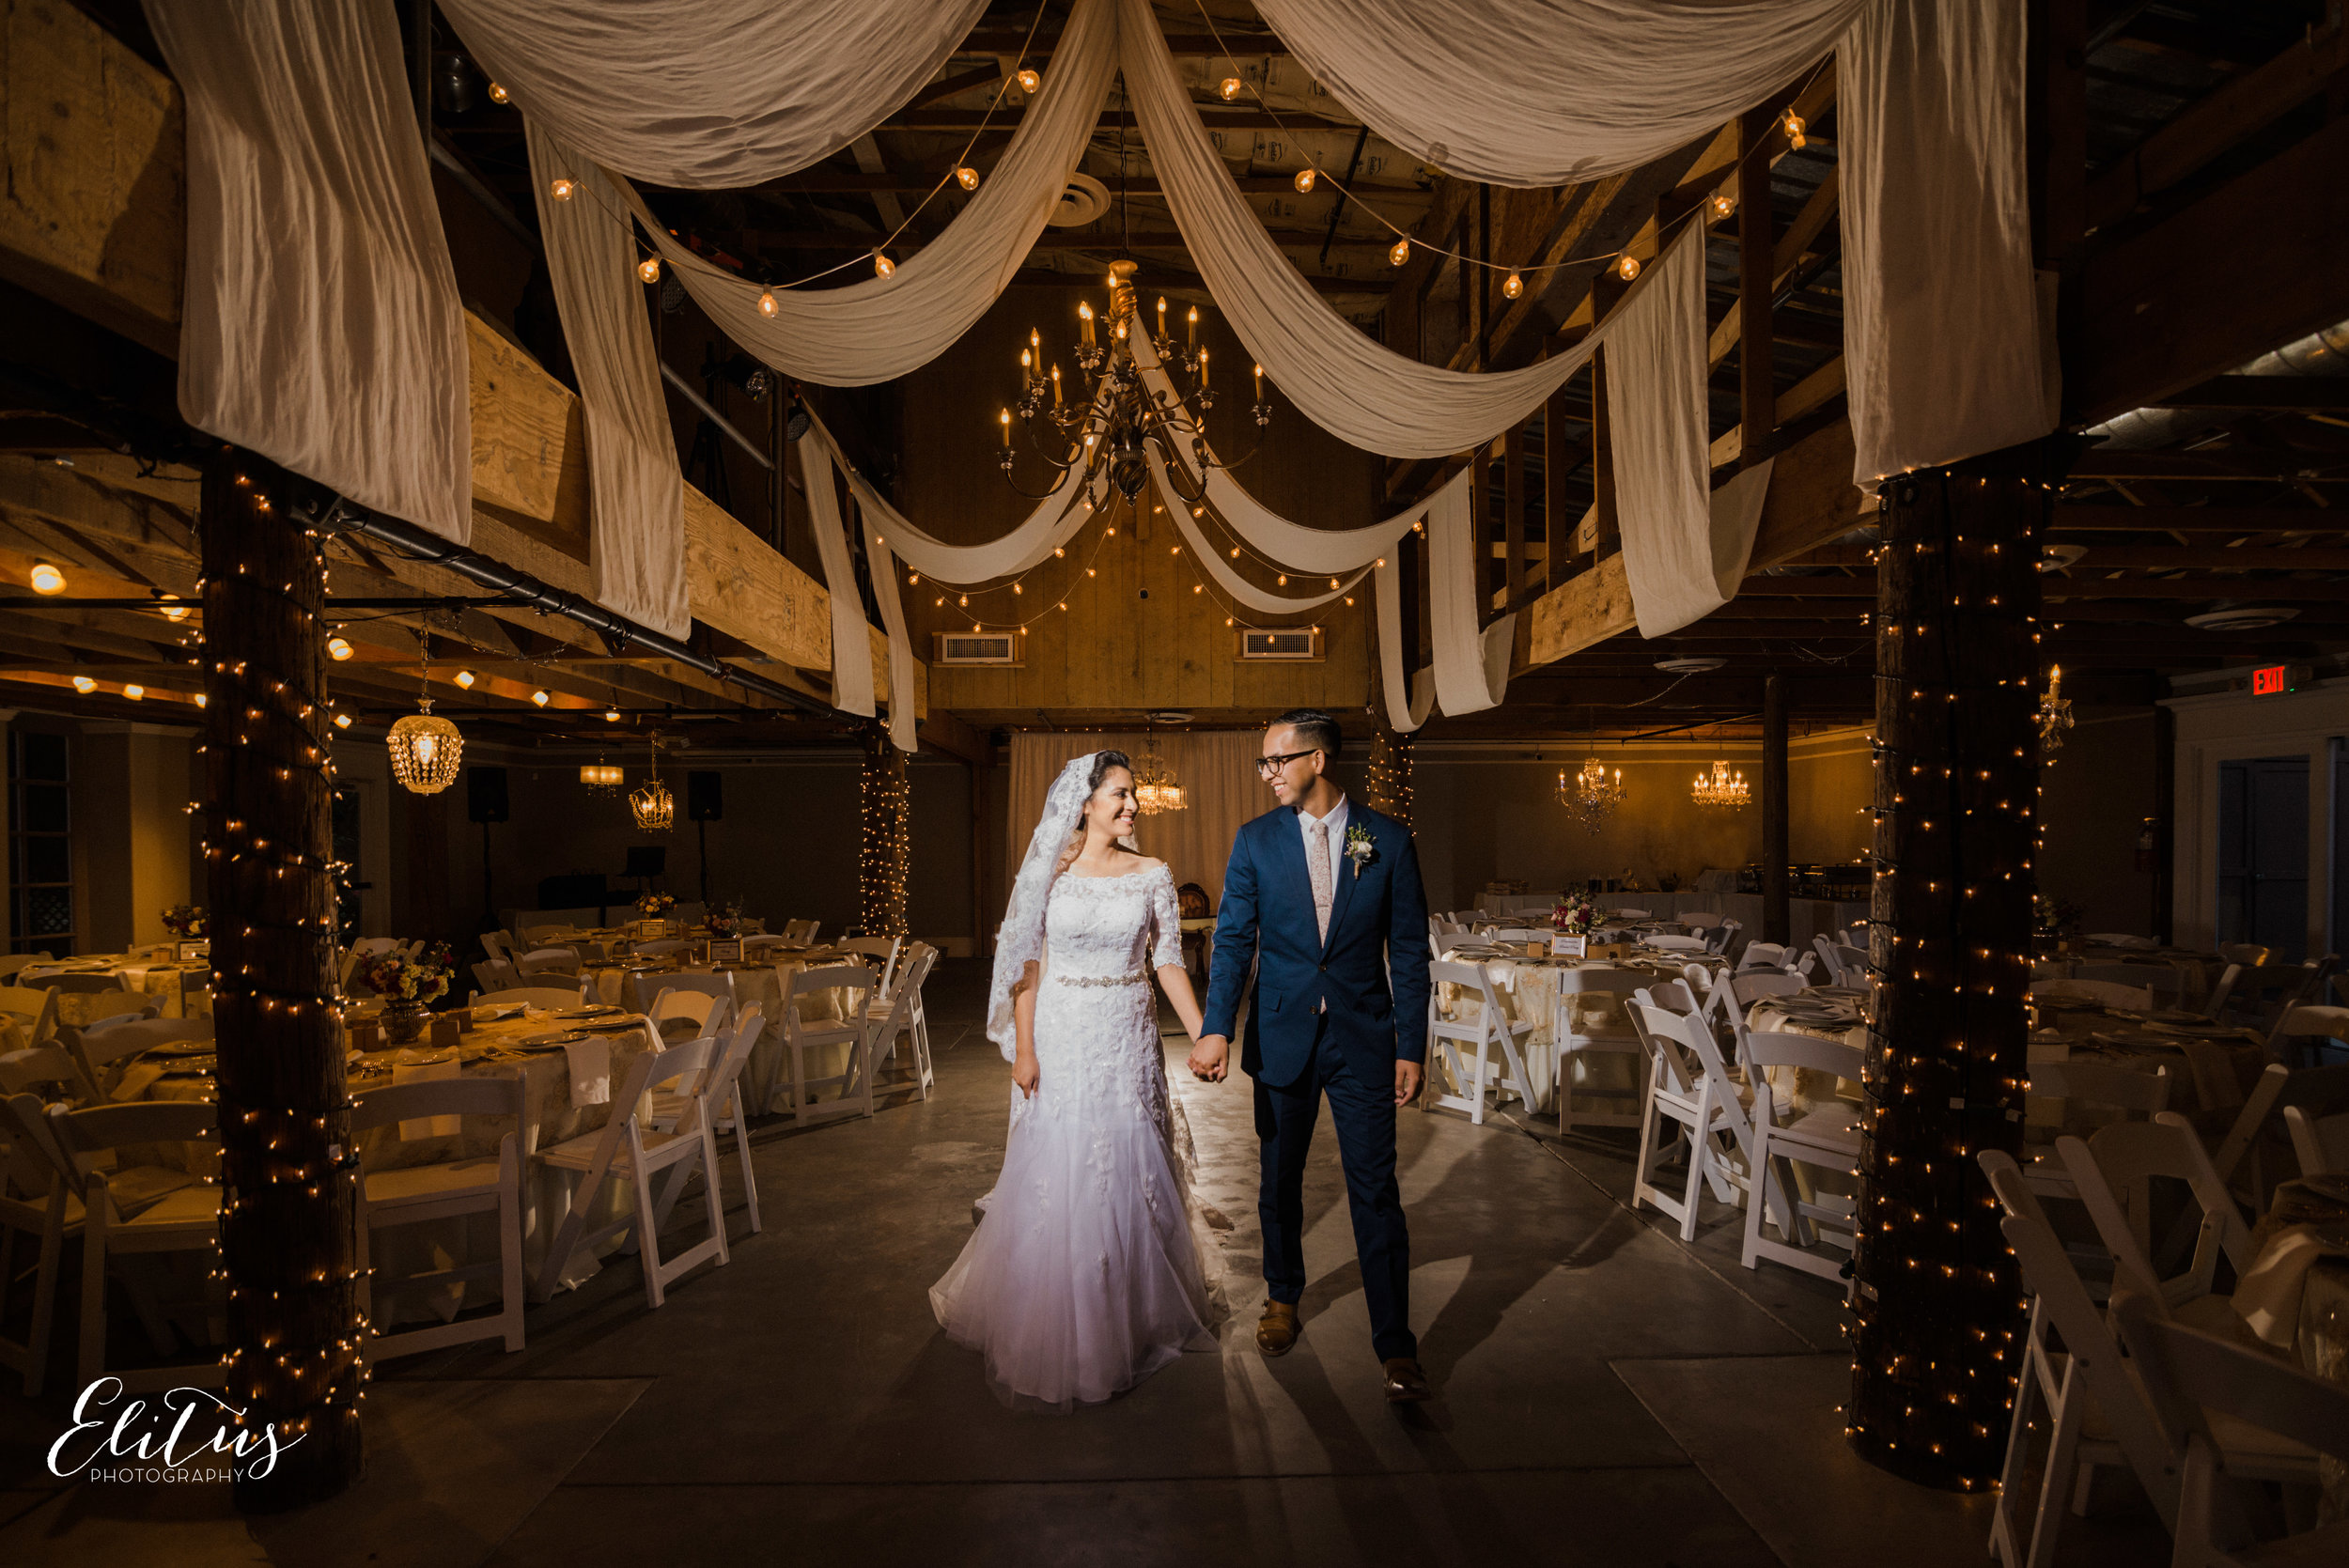 elitus-photography-eliandfredo-elegant-barn-wedding-937.jpg